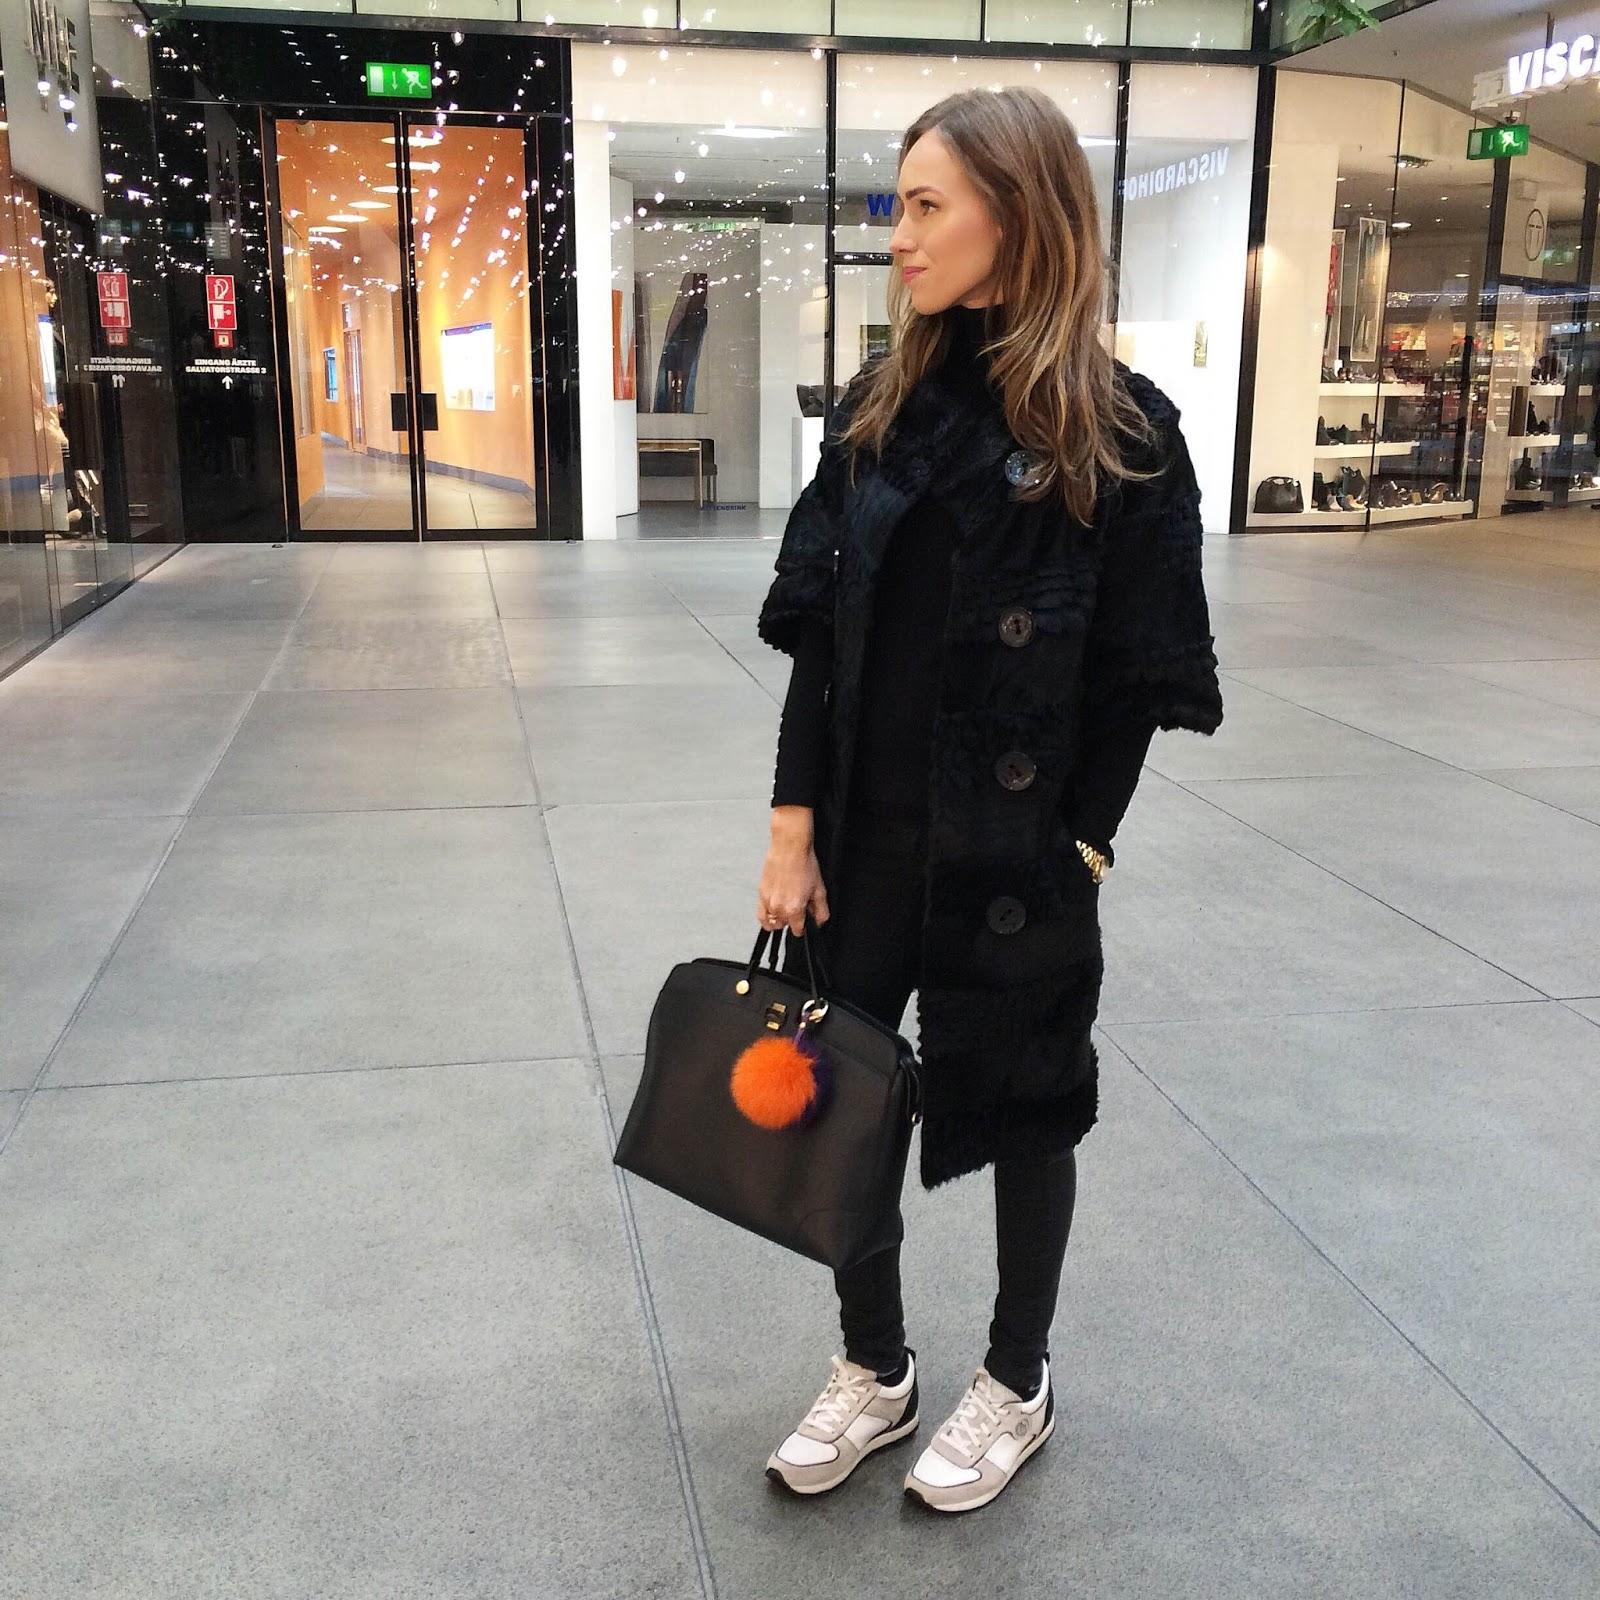 kristjaana mere black fur coat black jeans white sneakers winter style outfit